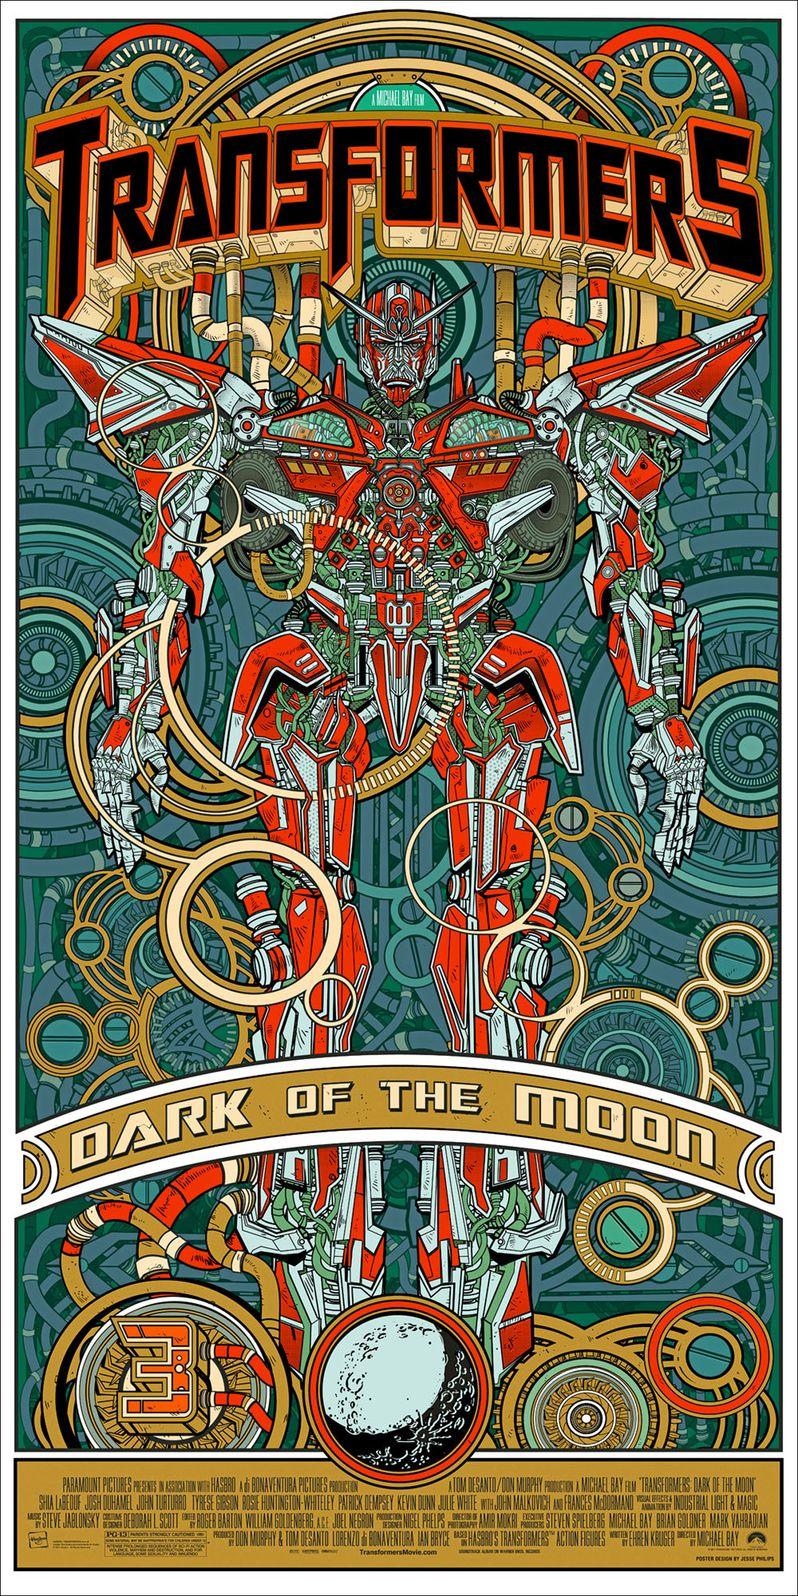 Transformers Dark of the Moon Alamo Drafhouse Poster #2